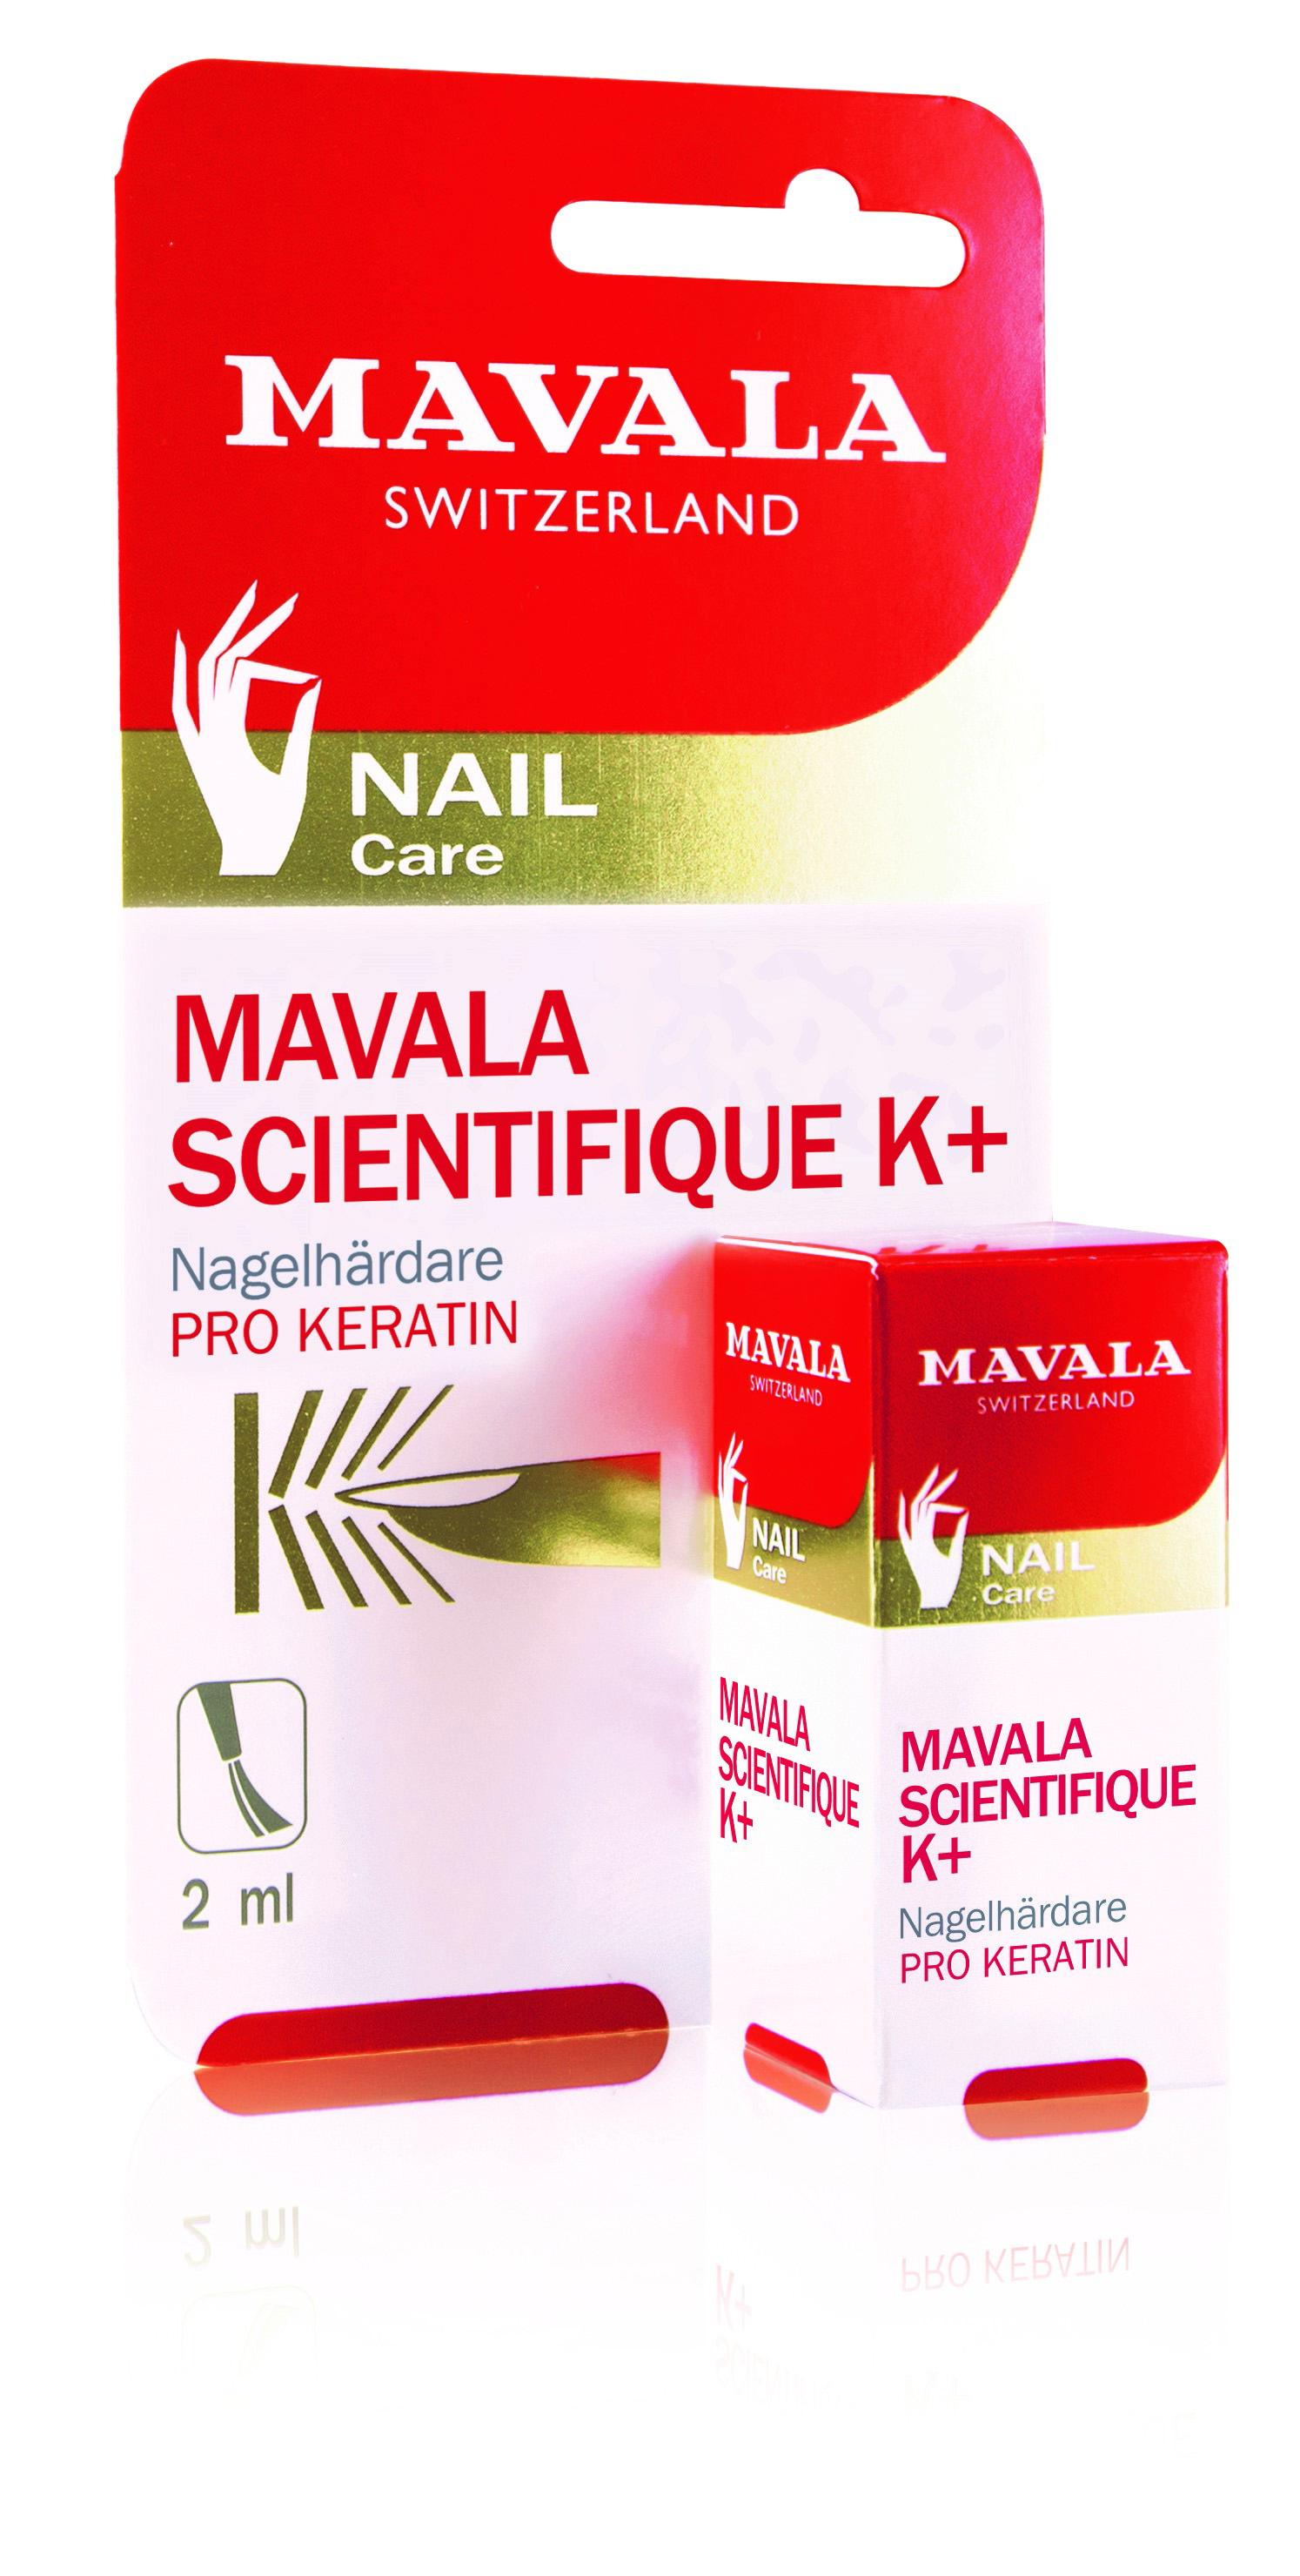 Mavala Scientifique K+ 2ml